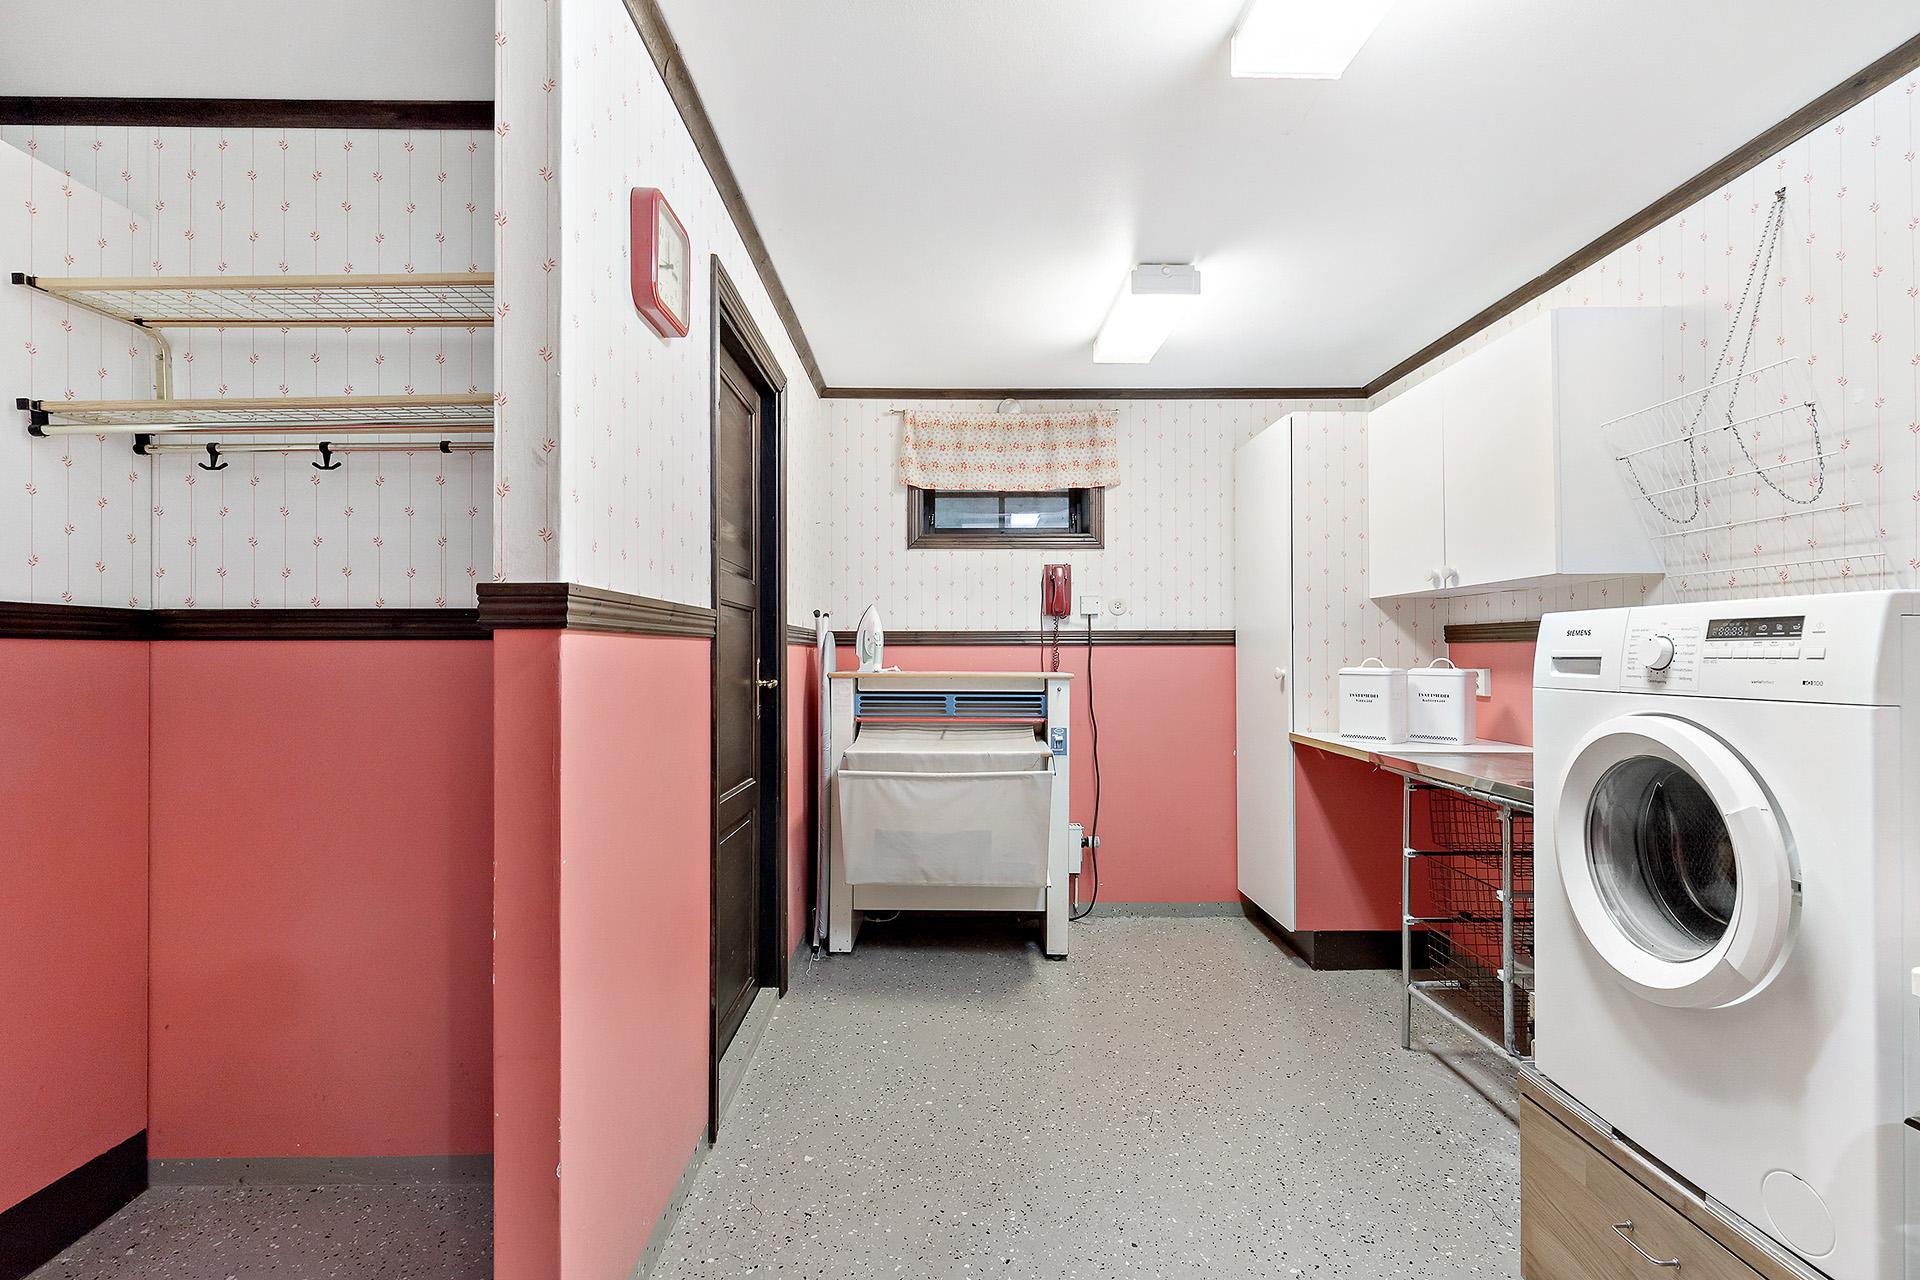 Groventré och tvättutrymme, källarplan